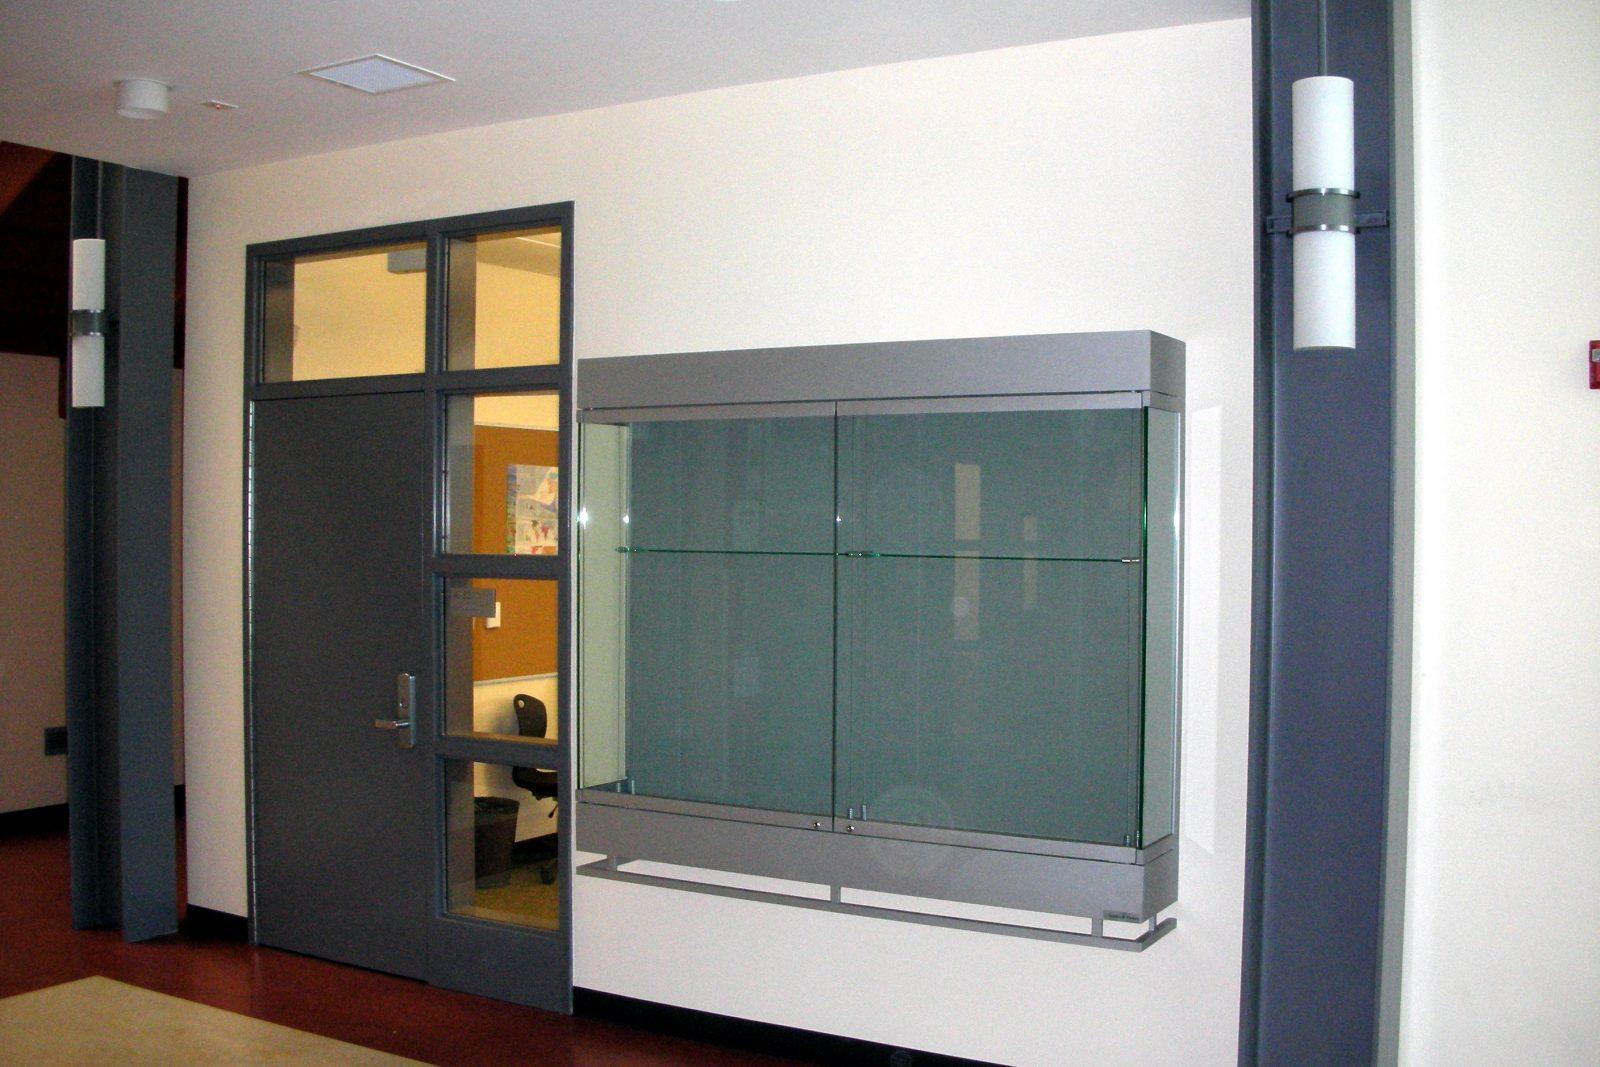 American Canyon High School - CA & Pivot Hinge Door Display Cases - The Tablet \u0026 Ticket Co.